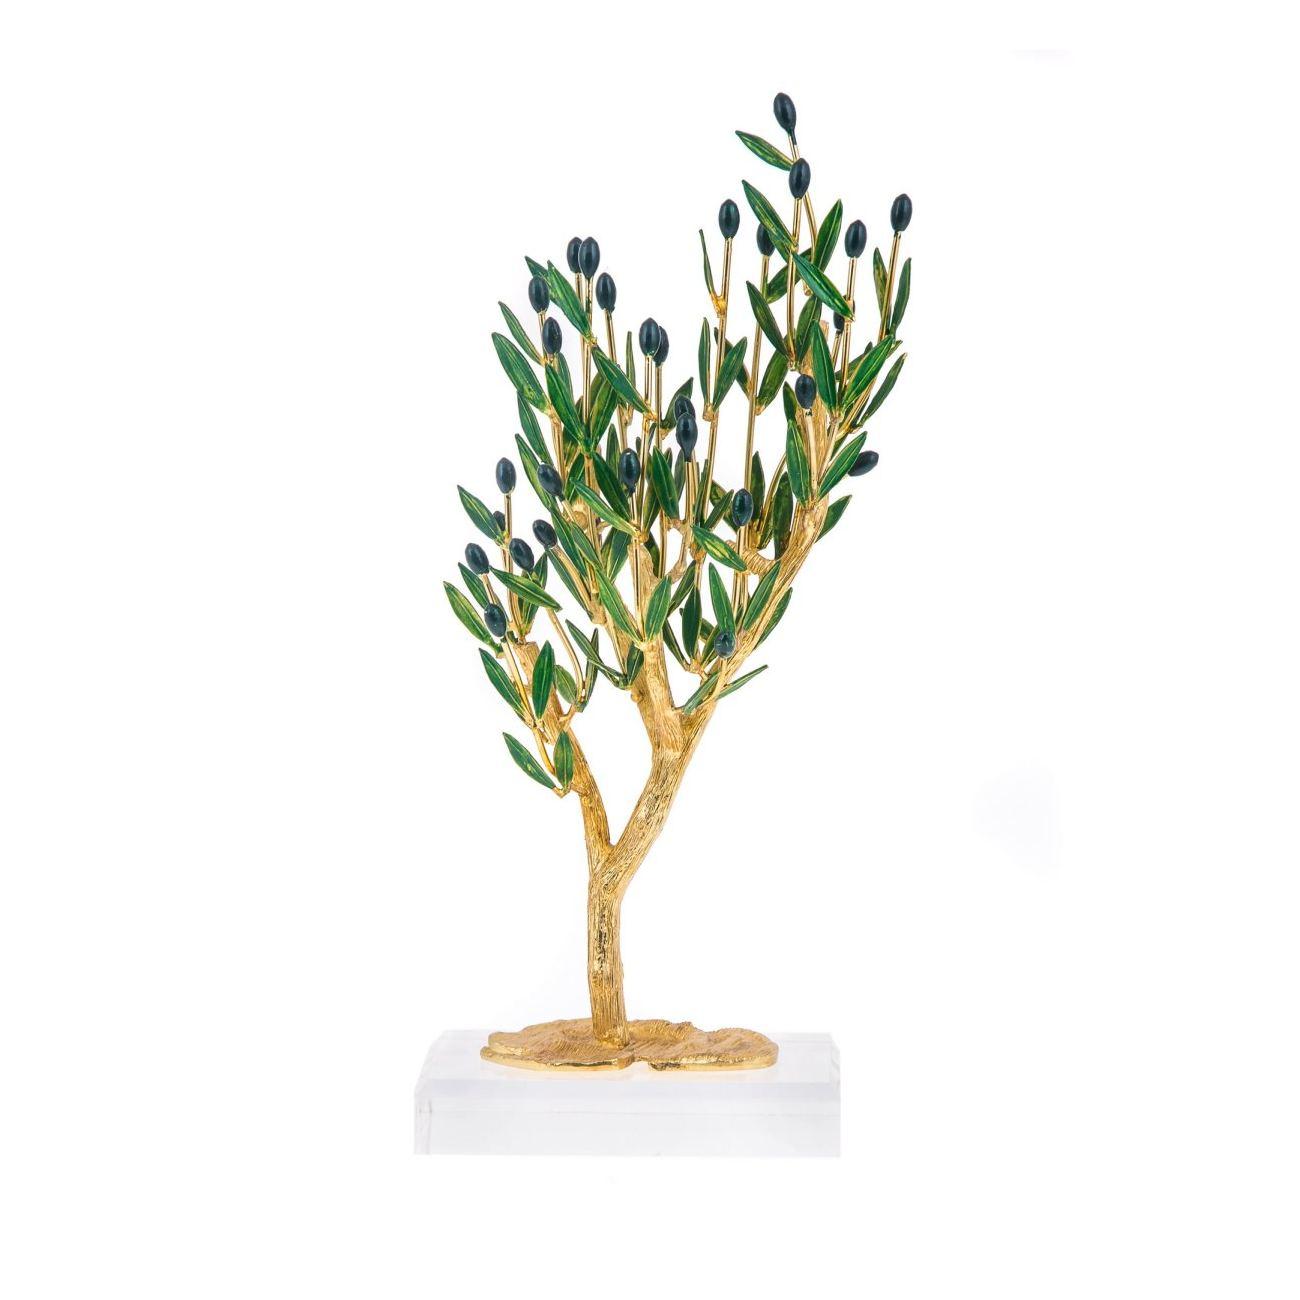 automotive tree light palm green decor decorative longlife com amazon dp rope